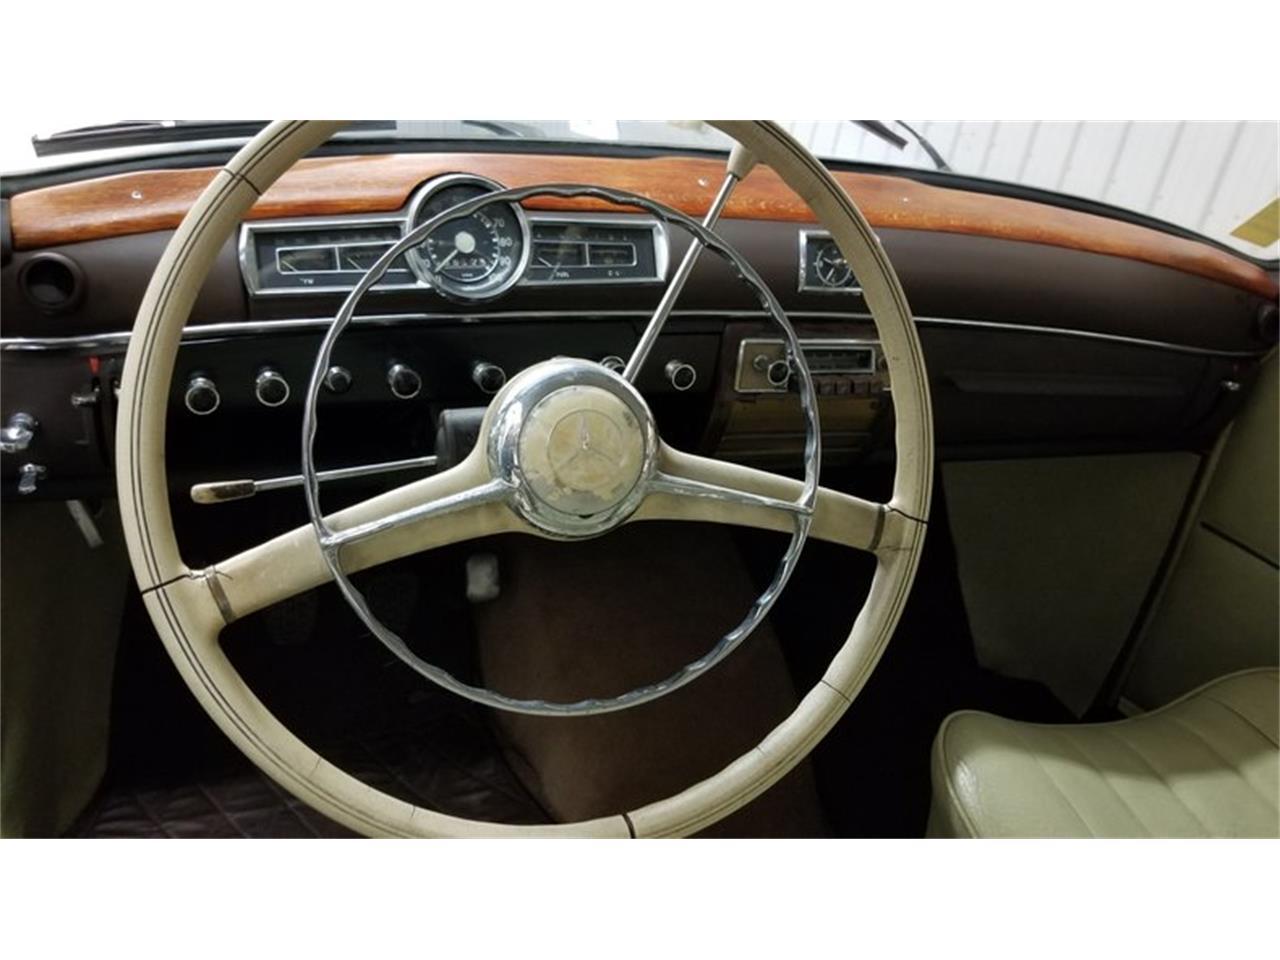 1959 Mercedes-Benz 190 for sale in Mankato, MN ...